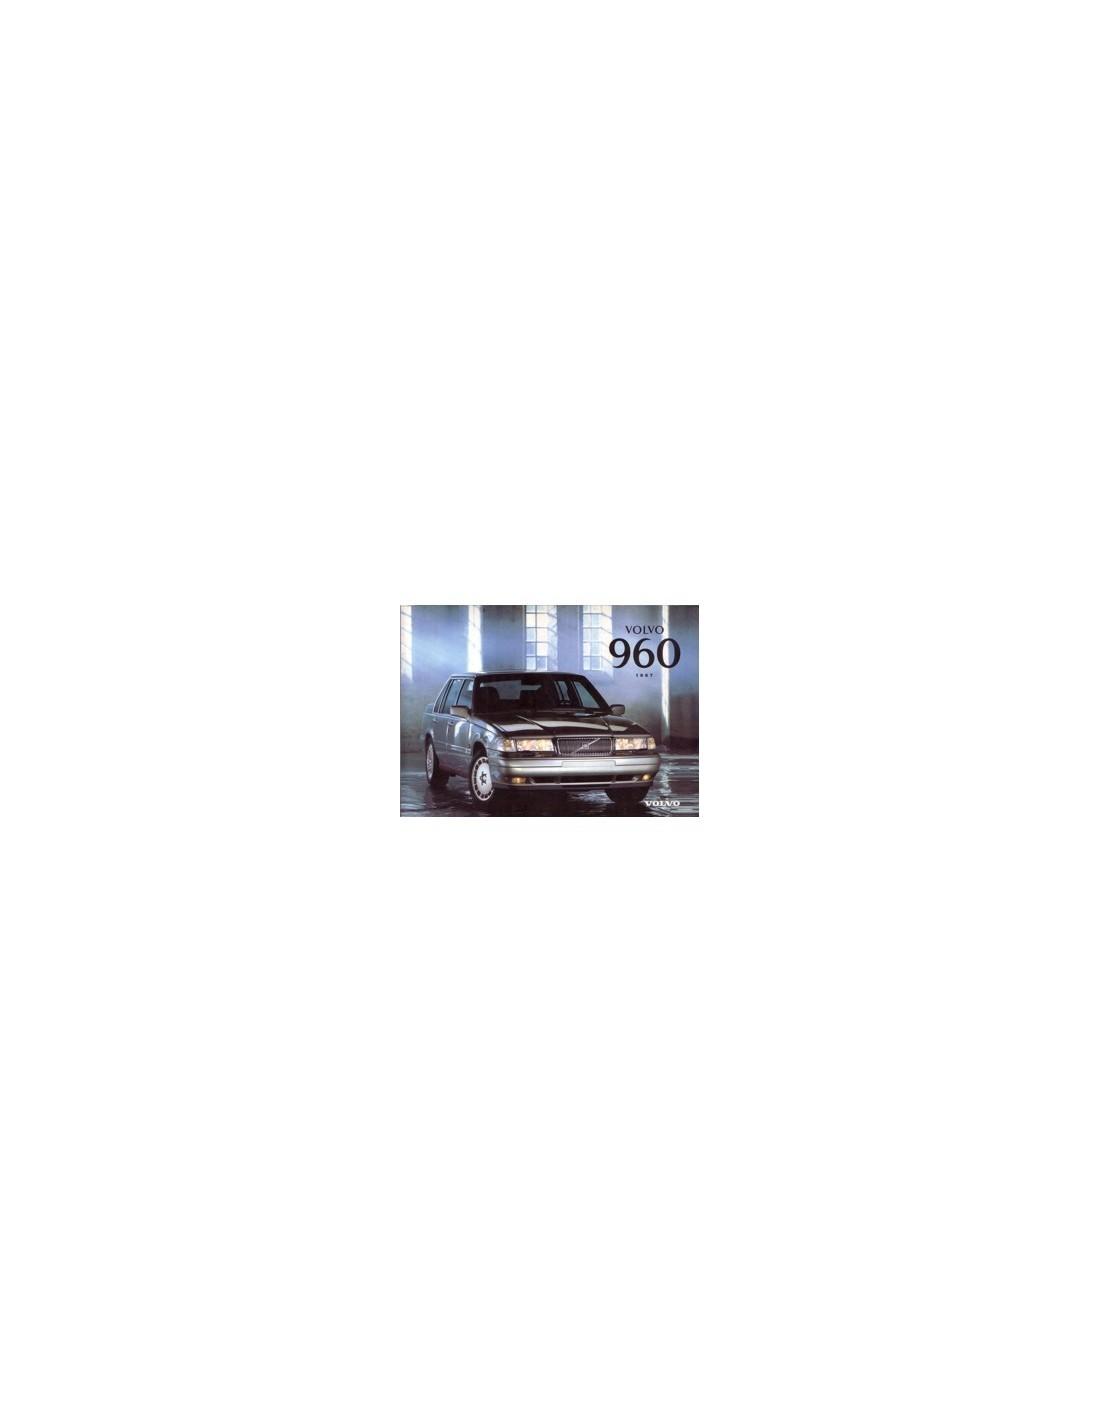 1997 volvo 960 owners manual handbook dutch automotive literature rh autolit eu Volvo 1997 960 with Rims 1997 Volvo 960 Gas Mileage